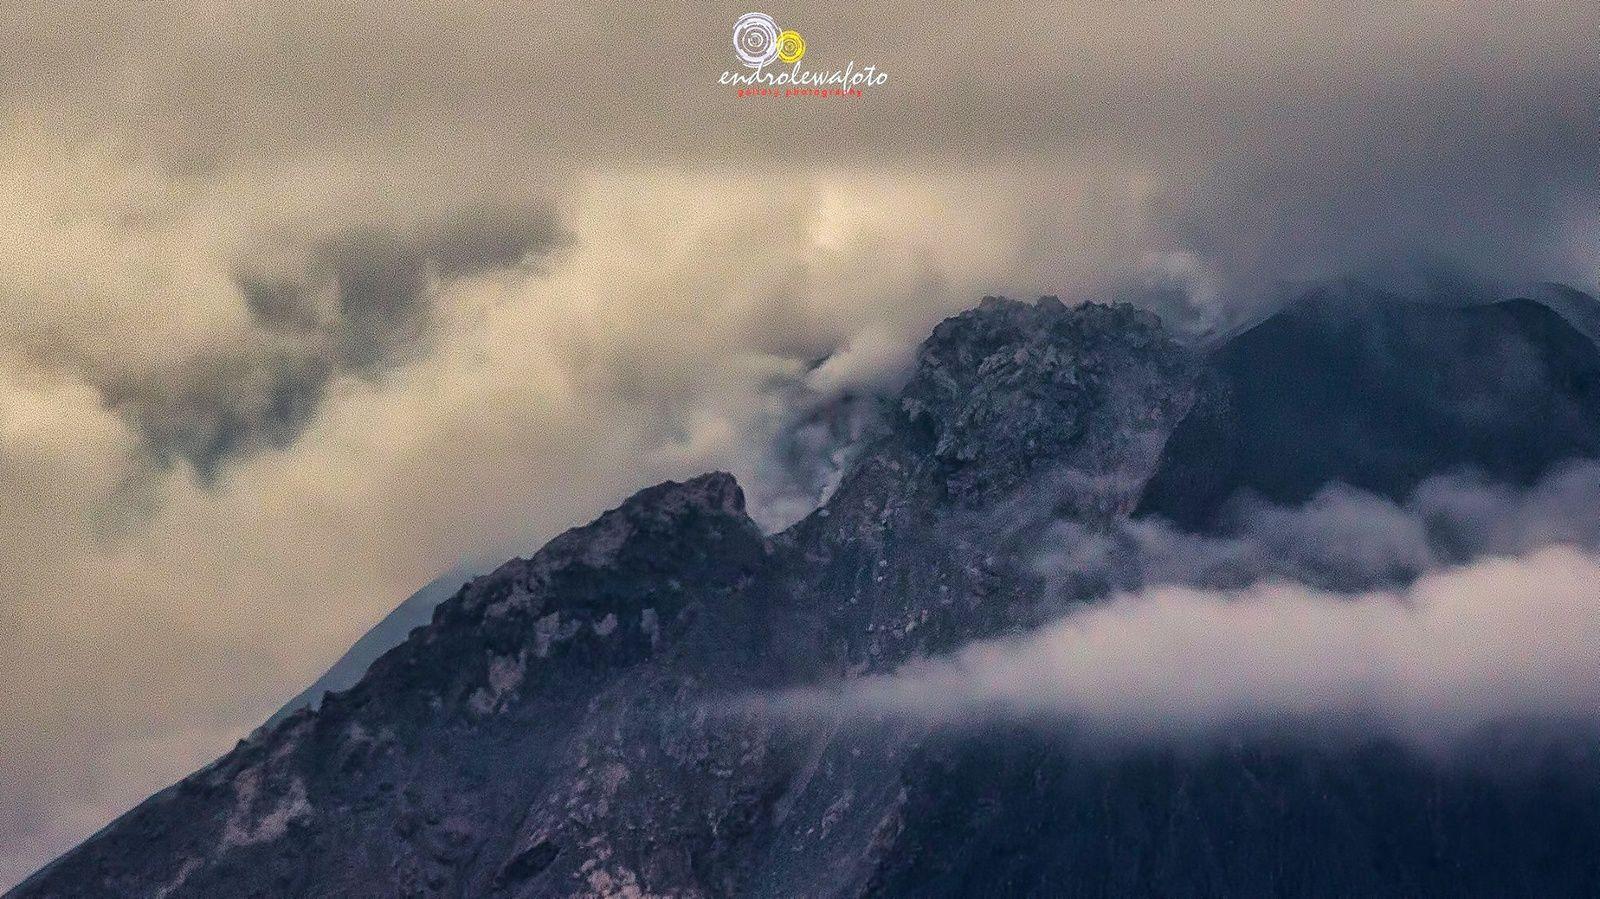 Sinabung le dôme ce 02.01.2017 / 16h23 - photo Endro Lewa